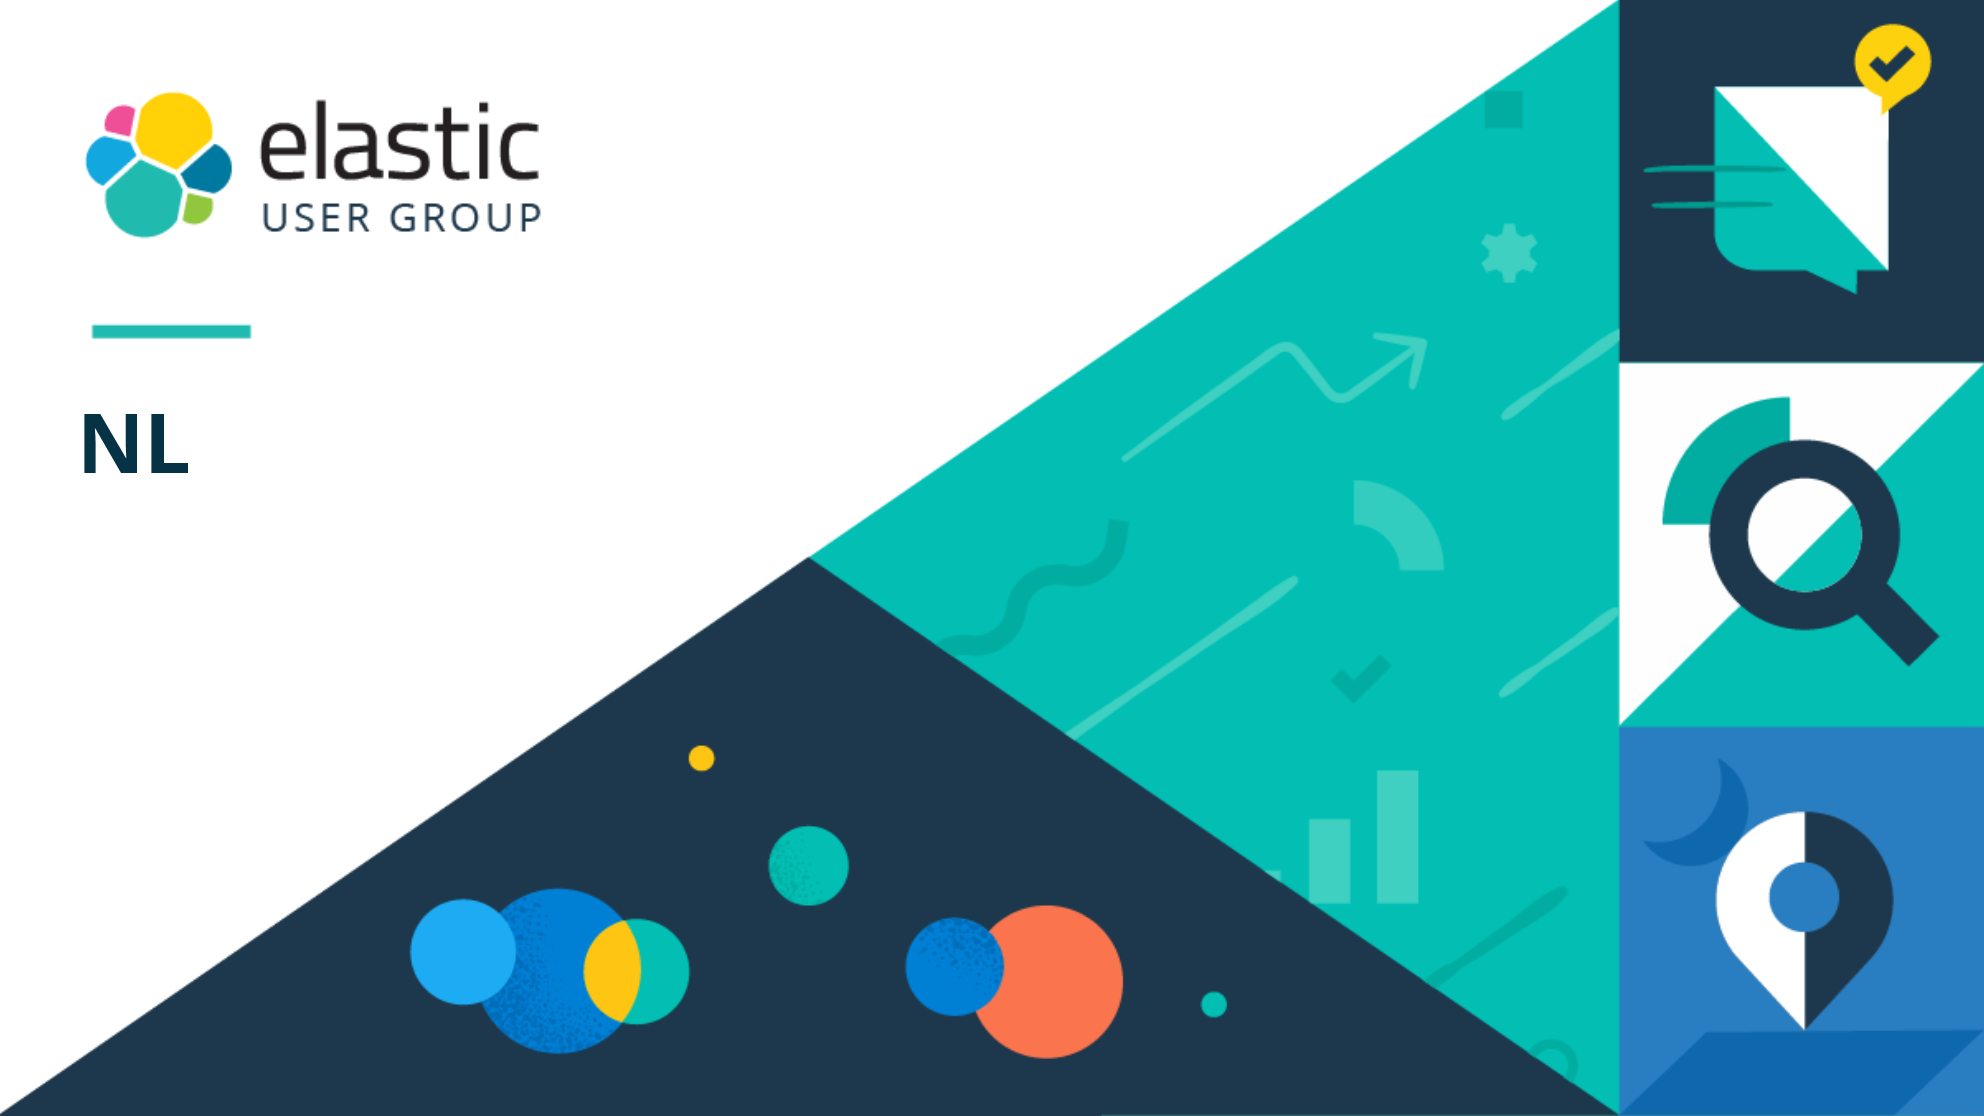 Elastic User Group NL